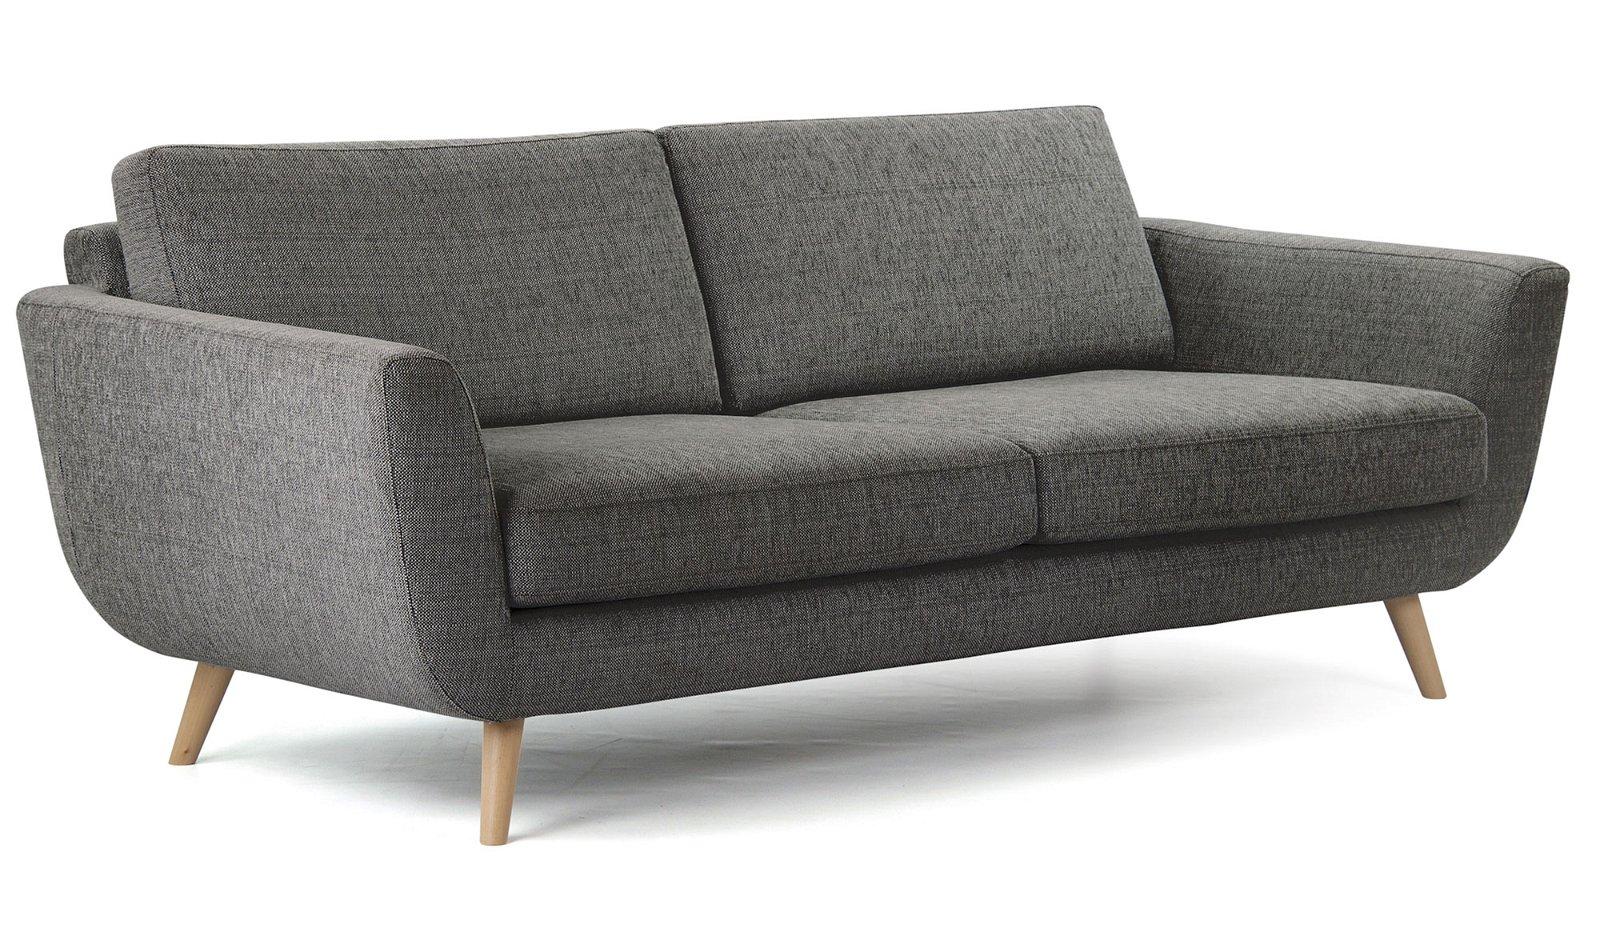 Sofá gris claro nórdico Alifan